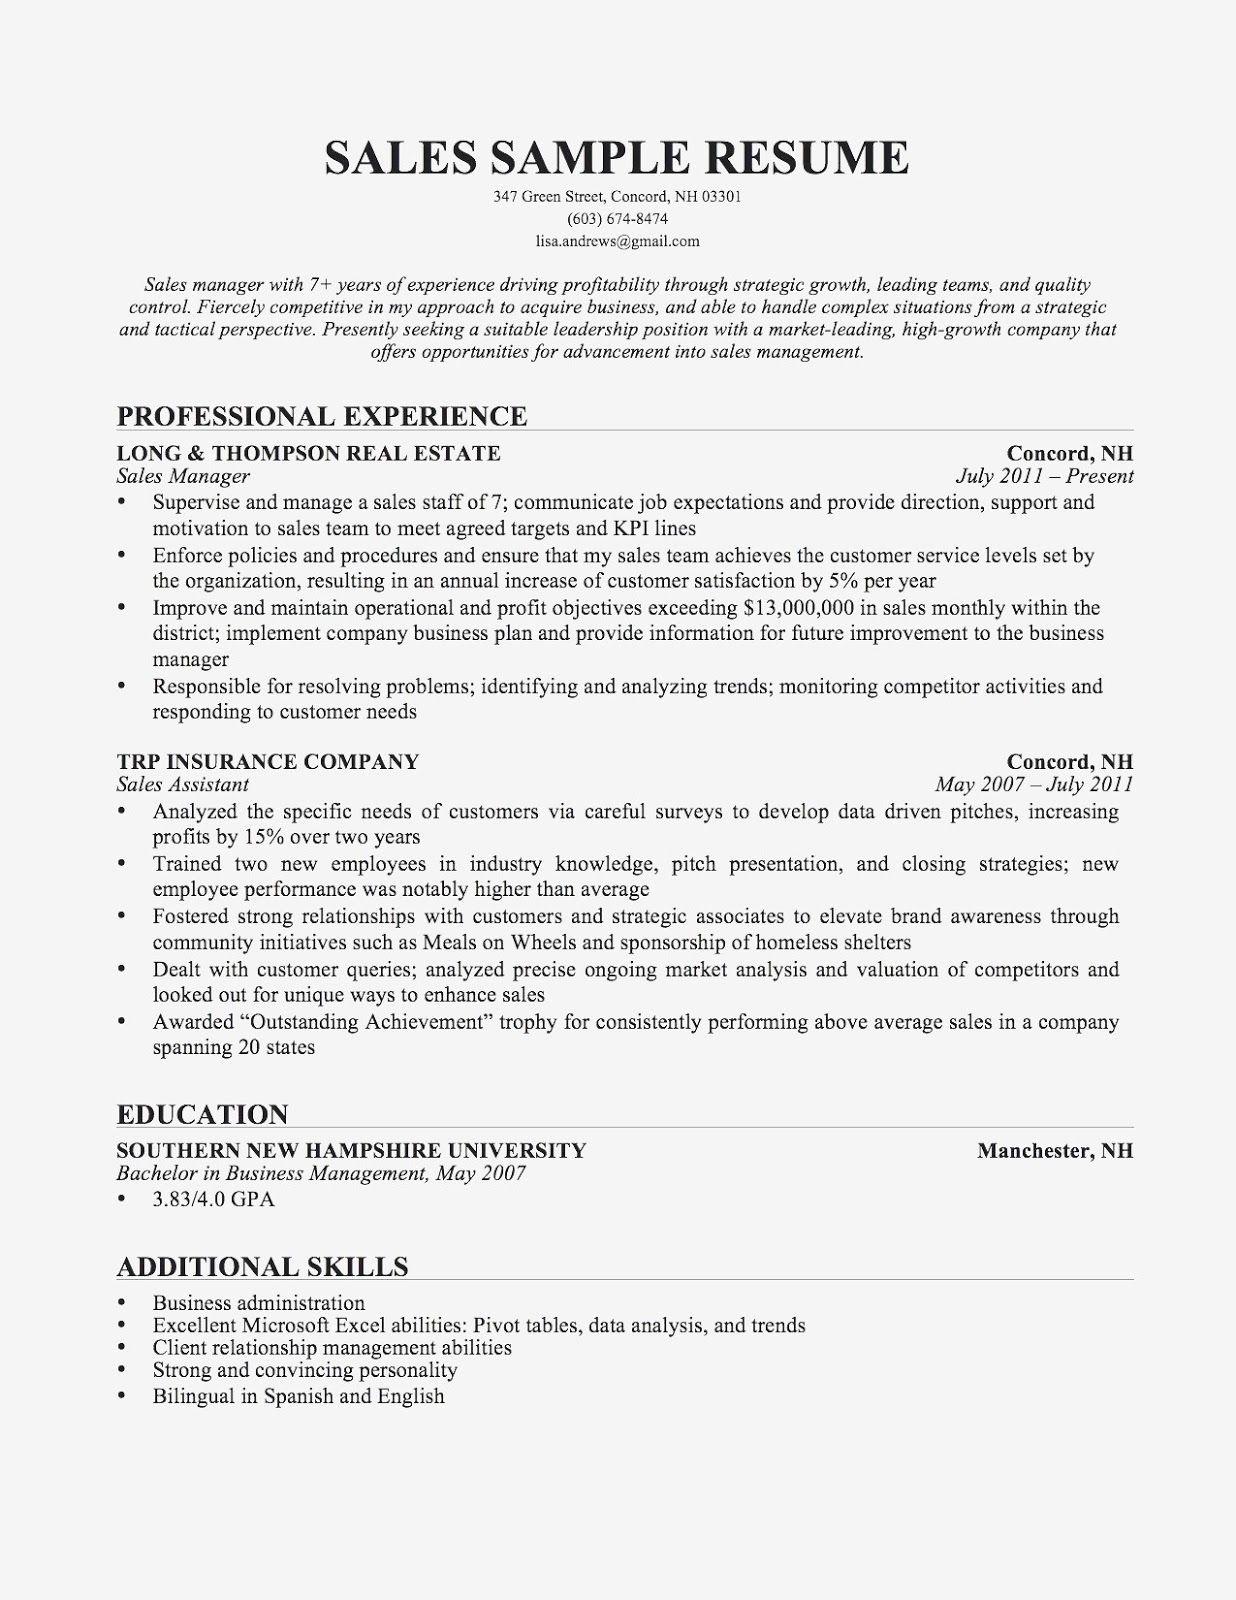 Academic resume sample 2019 Academic Cv Samples 2020 Karate